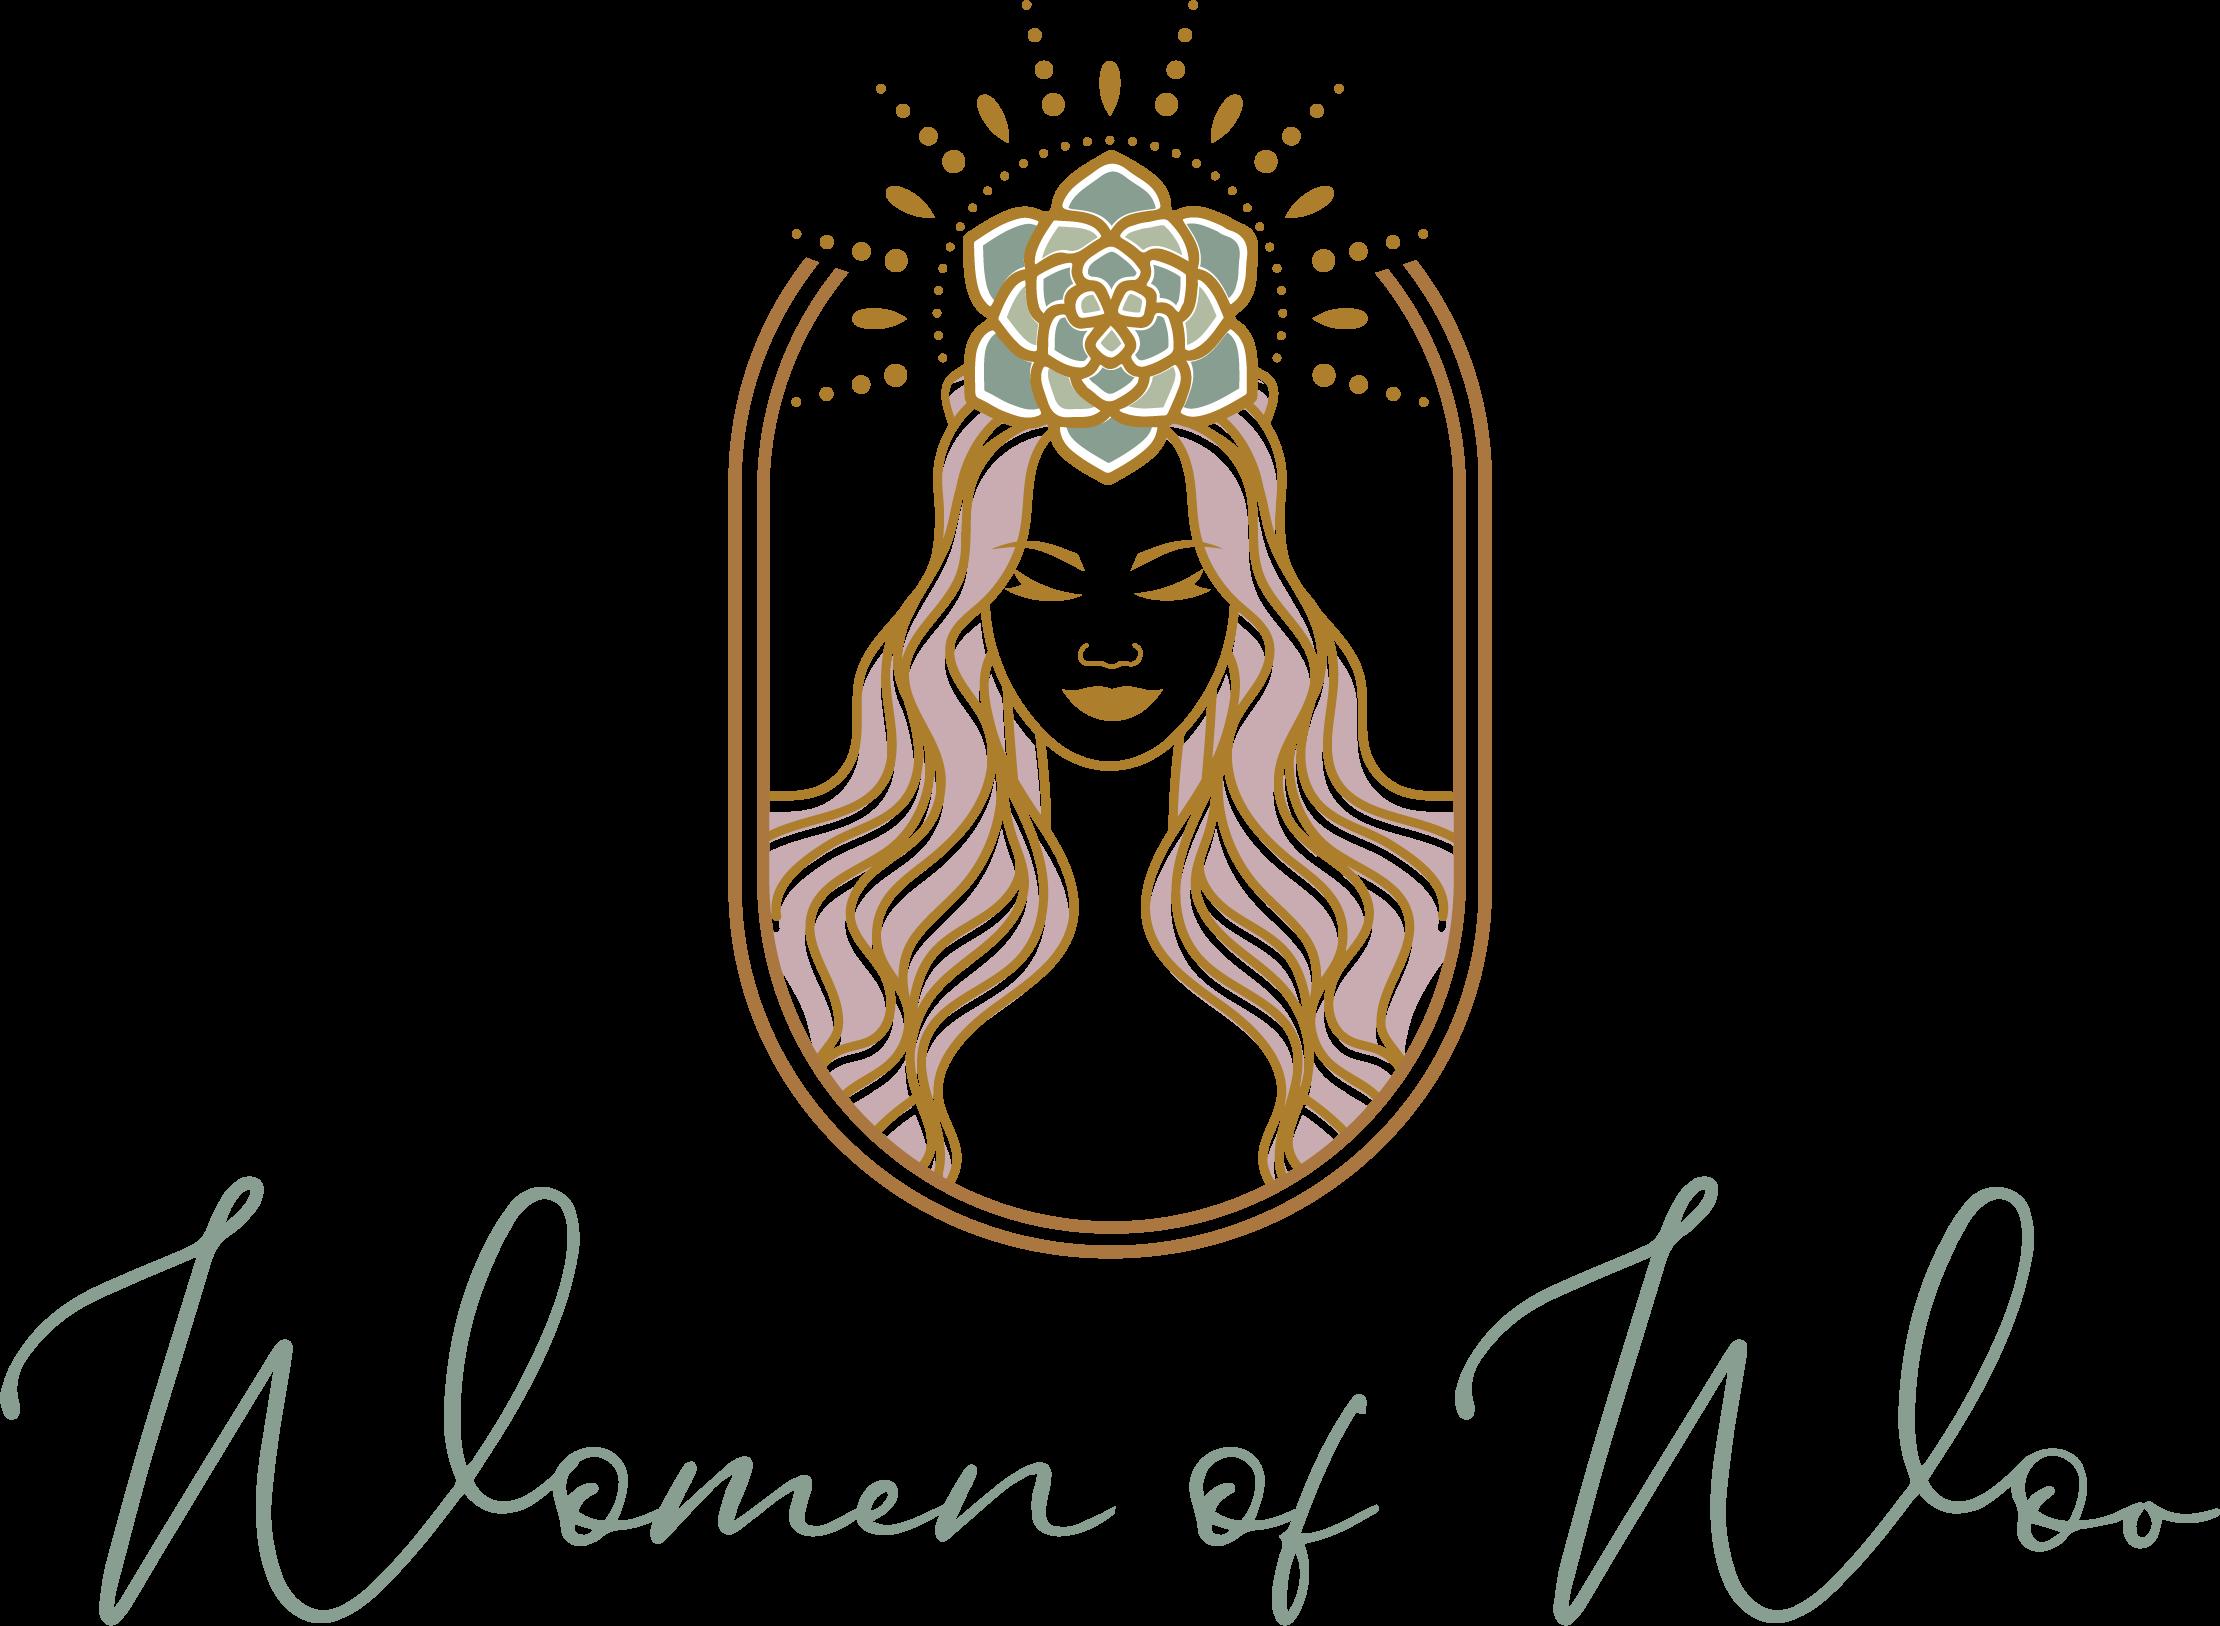 Women of Woo: Spirit Leader Design